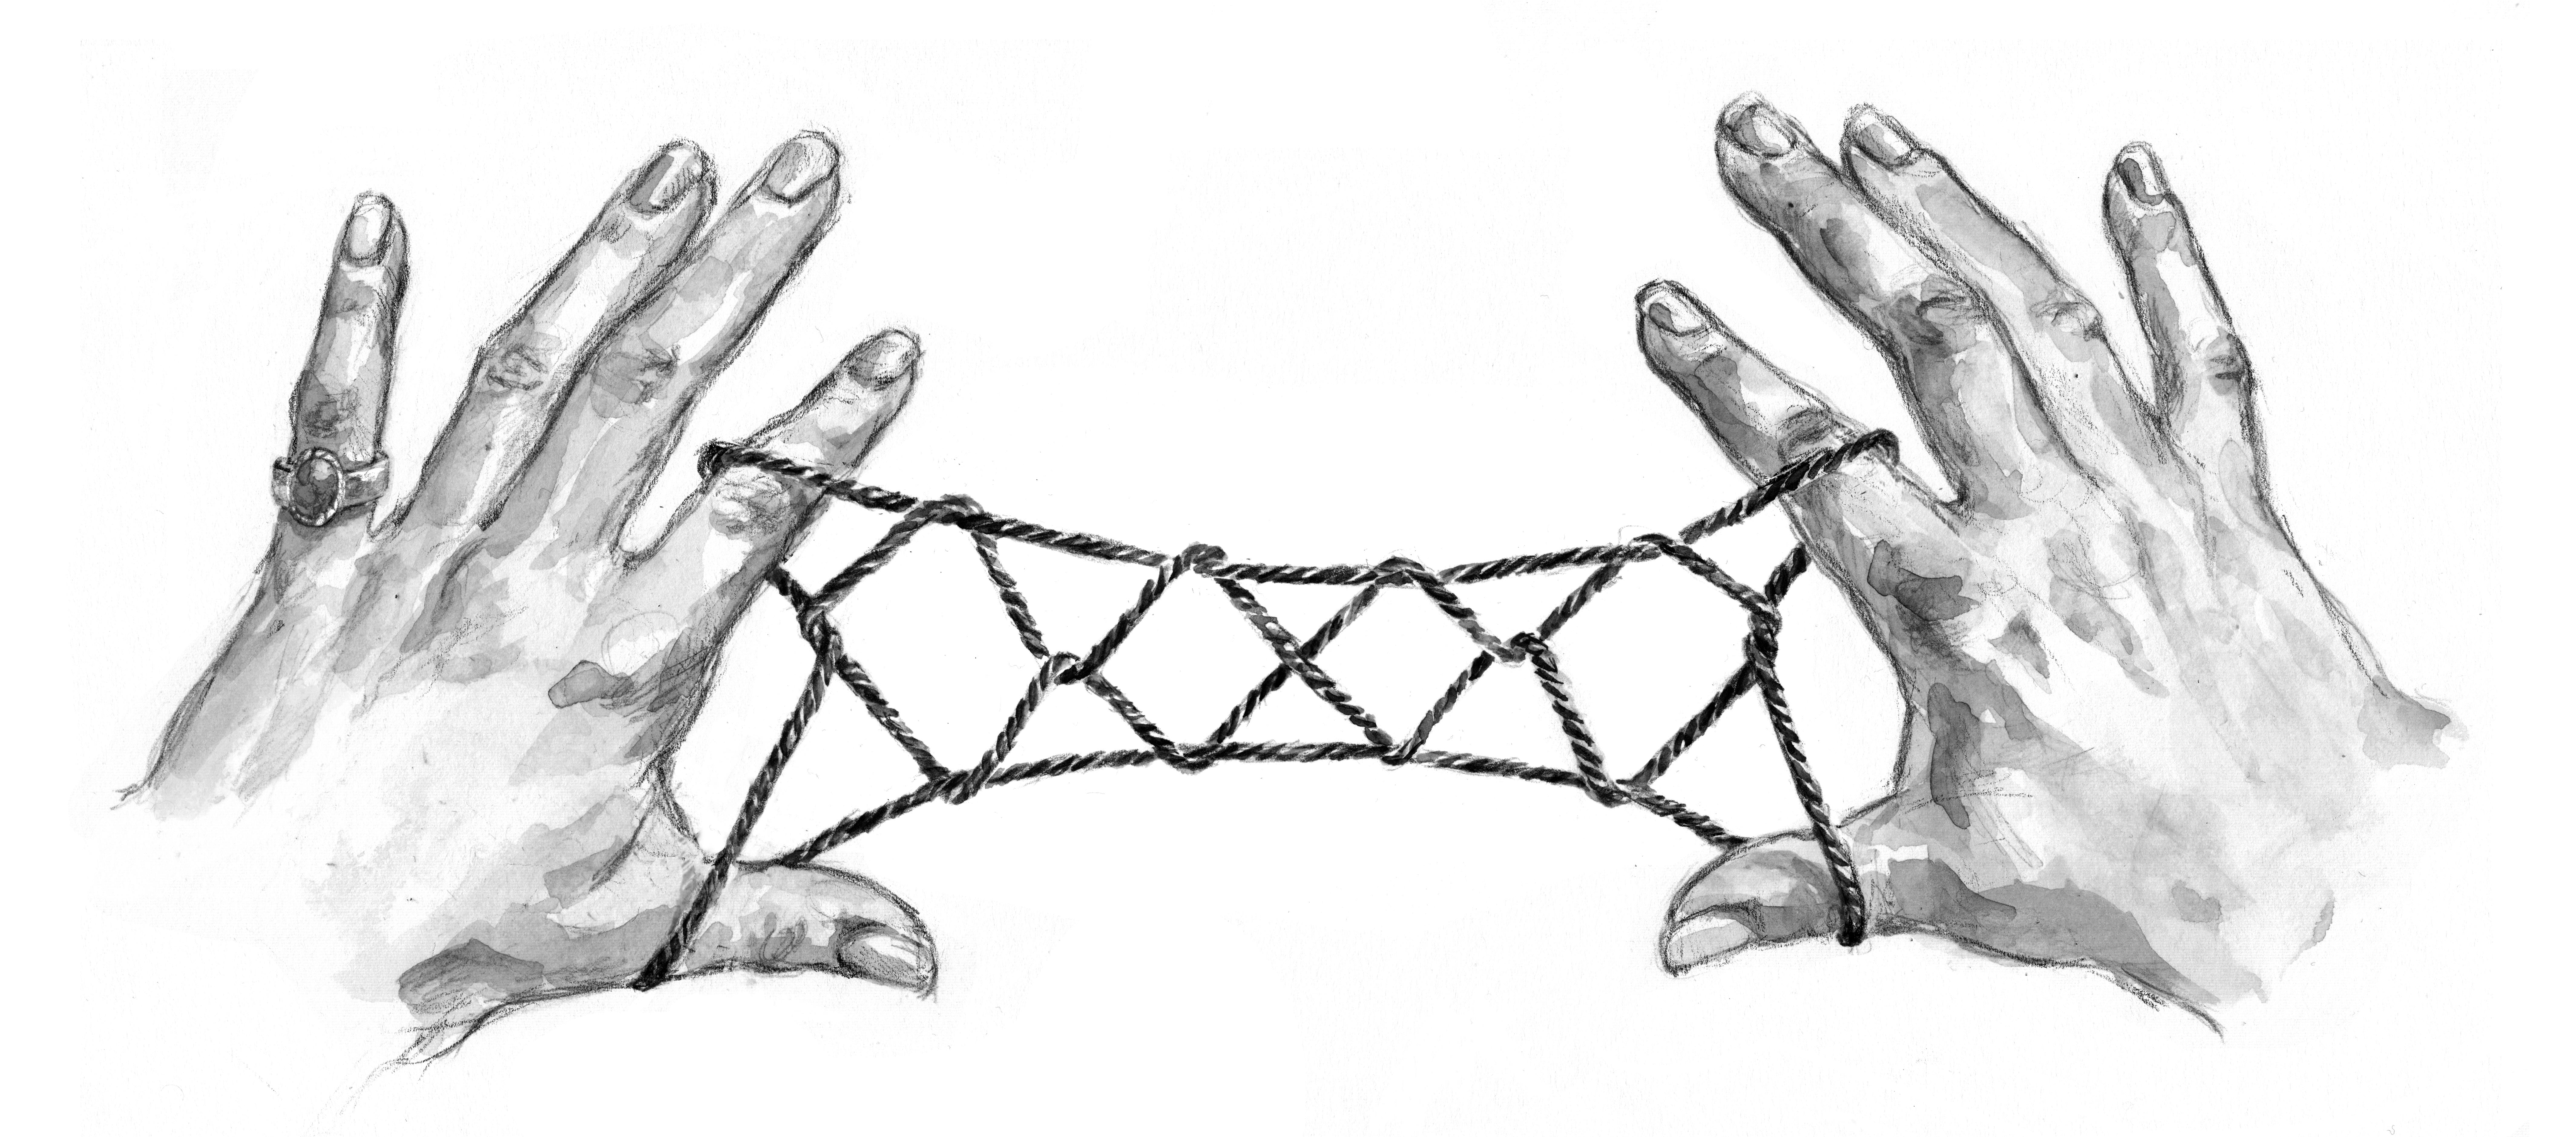 part_3_final_illustration